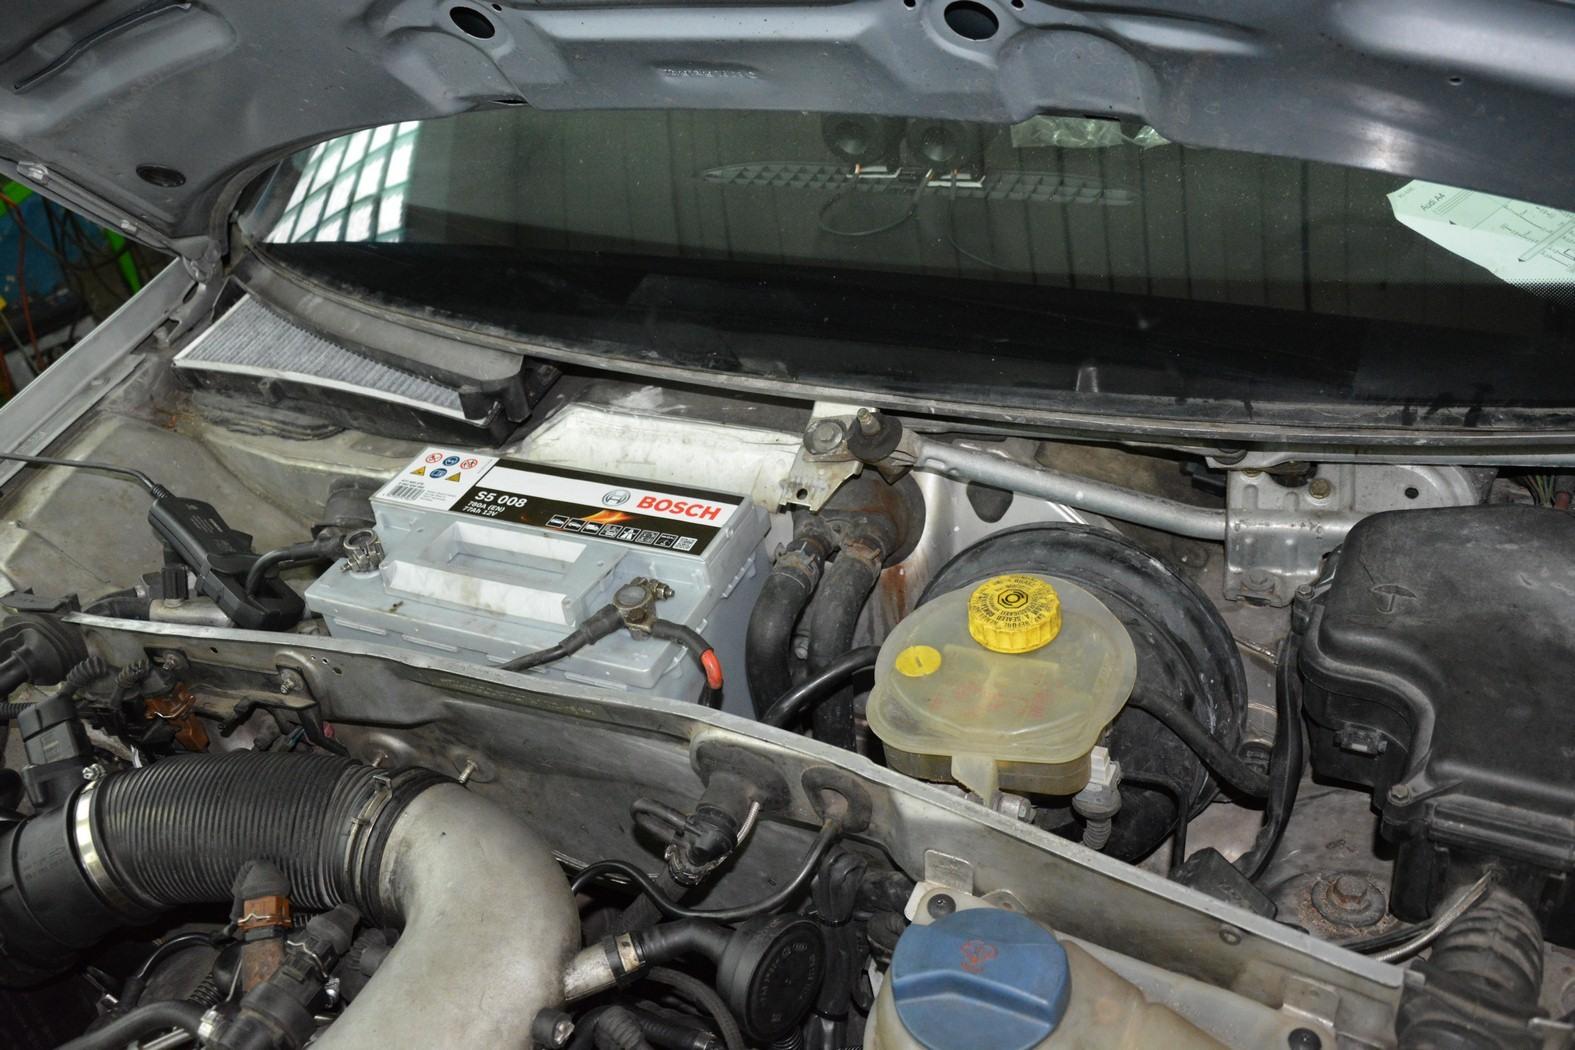 Akumulator pod pokrywą silnika